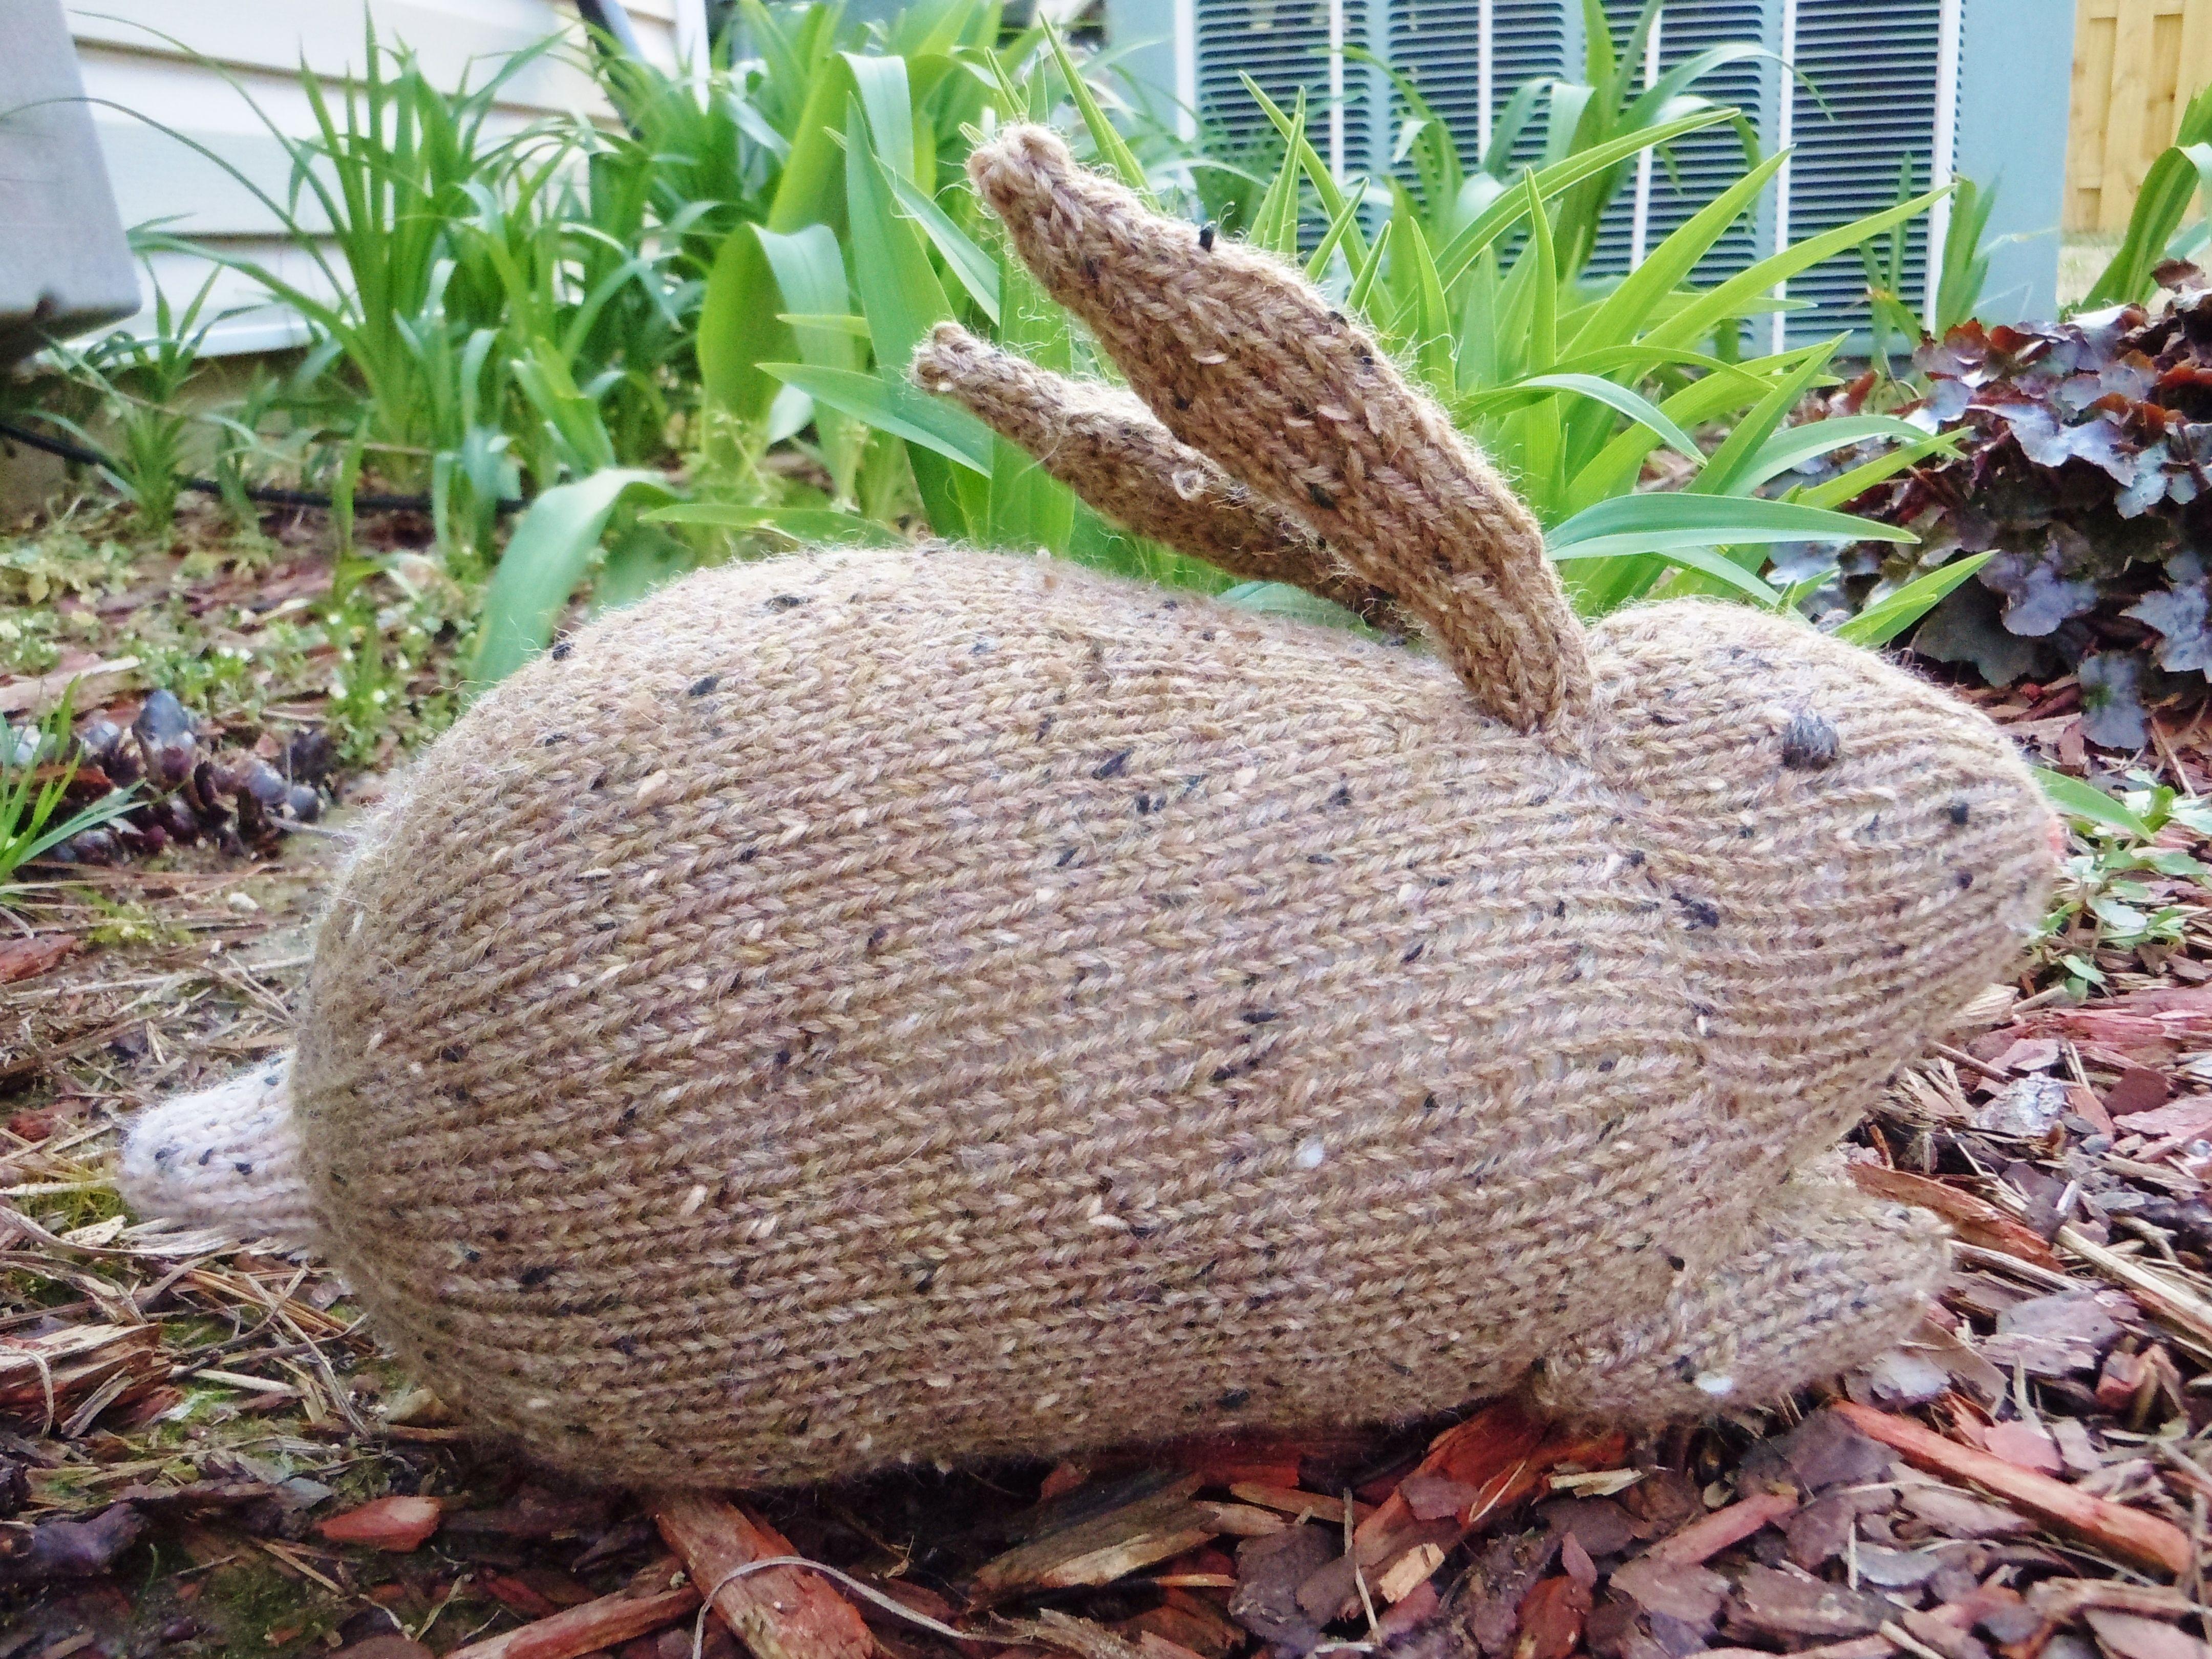 Beret Hat Knitting Pattern : Henrys Rabbit - Knitting Patterns and Crochet Patterns from KnitPicks.com